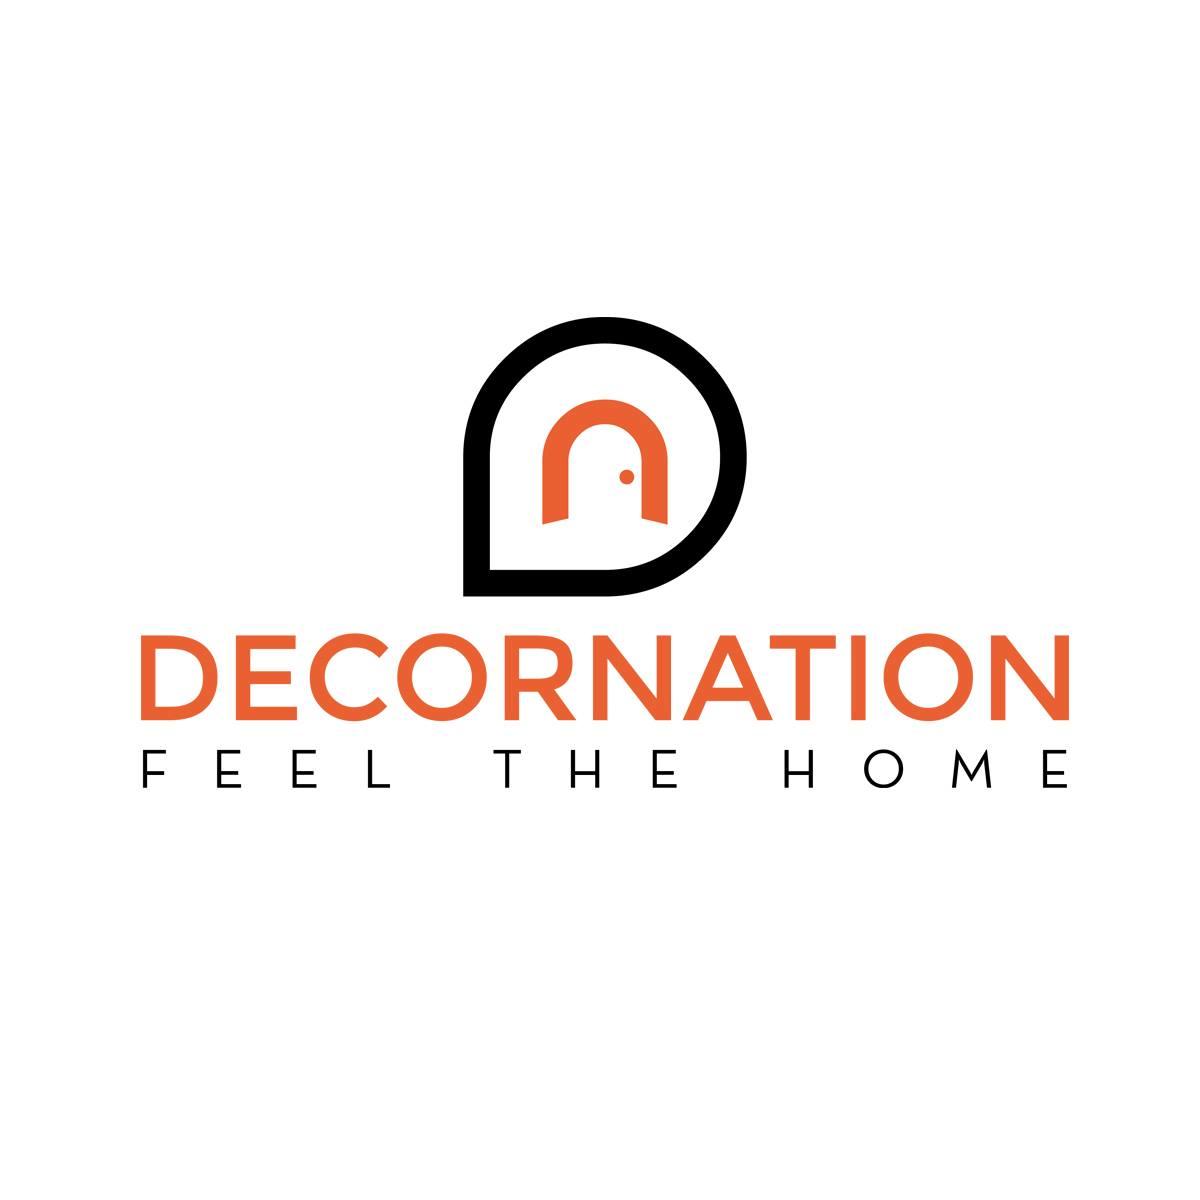 DECORNATION.in